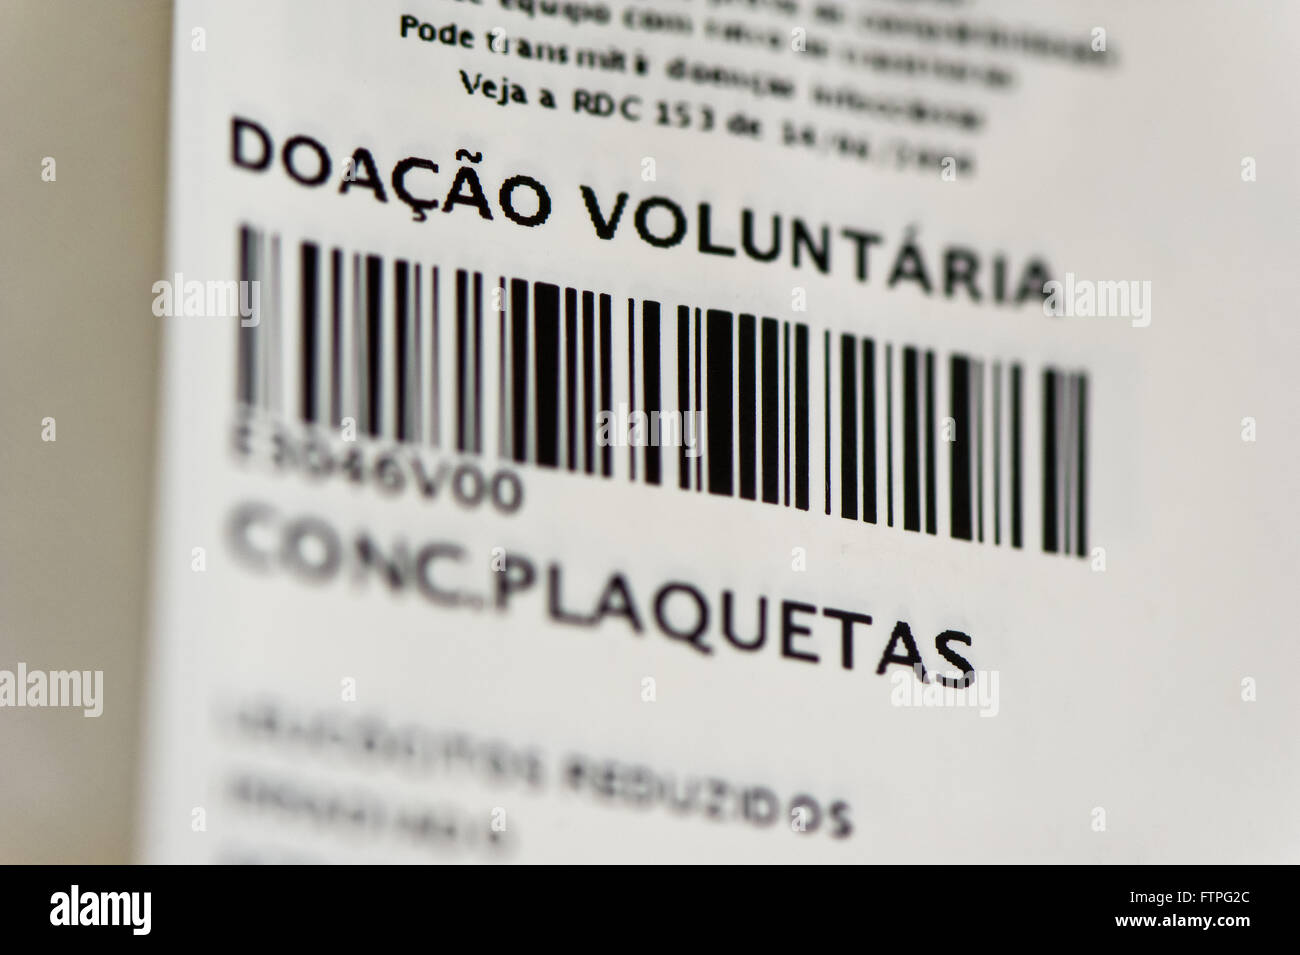 Barcode platelet bag - Stock Image